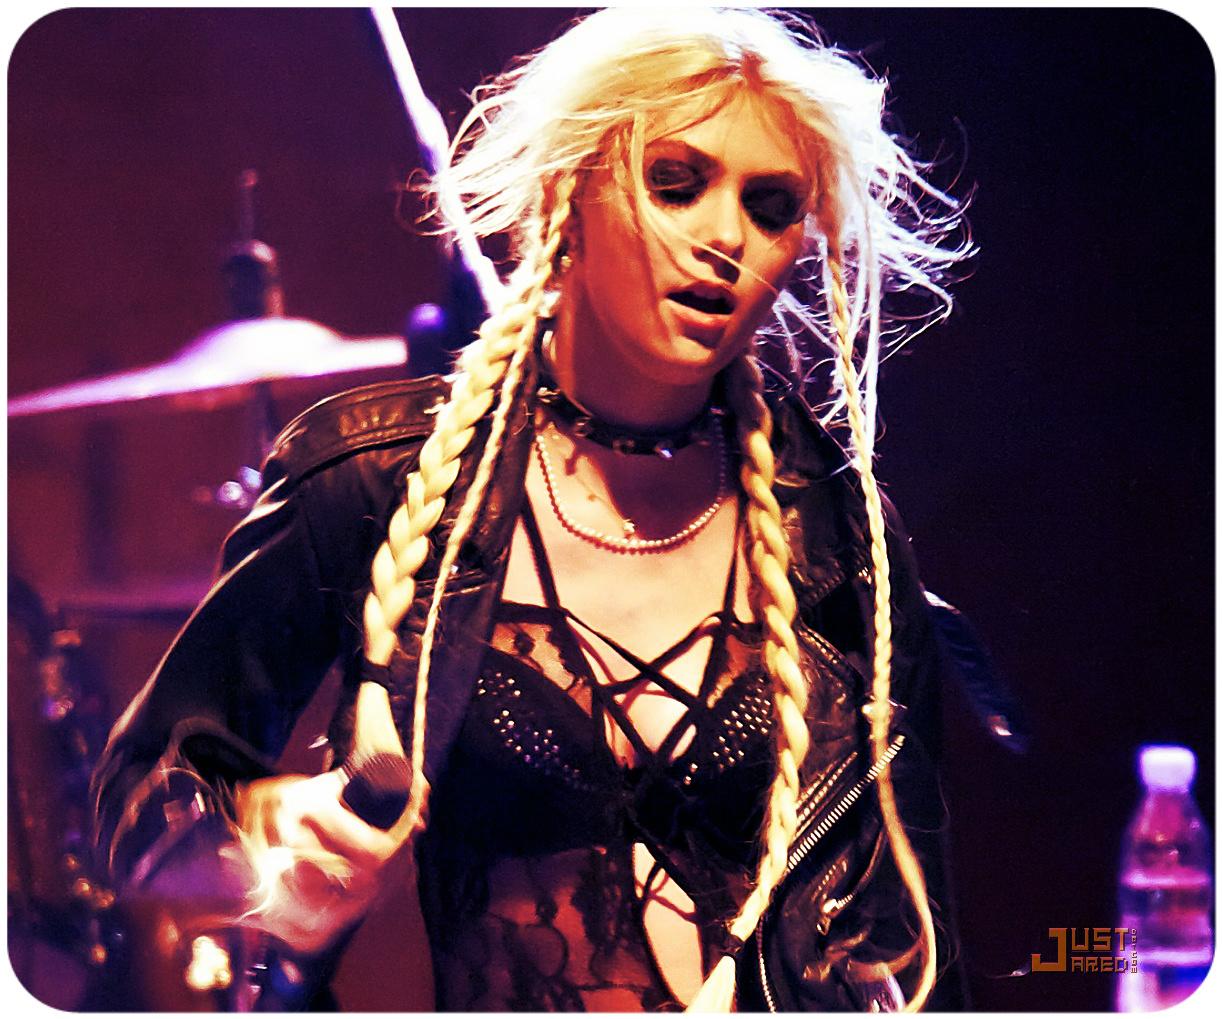 http://1.bp.blogspot.com/--W-CrvaoNww/UBvrEuwep0I/AAAAAAAAEIo/yHSWo-7336g/s1600/taylor-momsen-sala-caracol-with-the-pretty-reckless-06.jpg